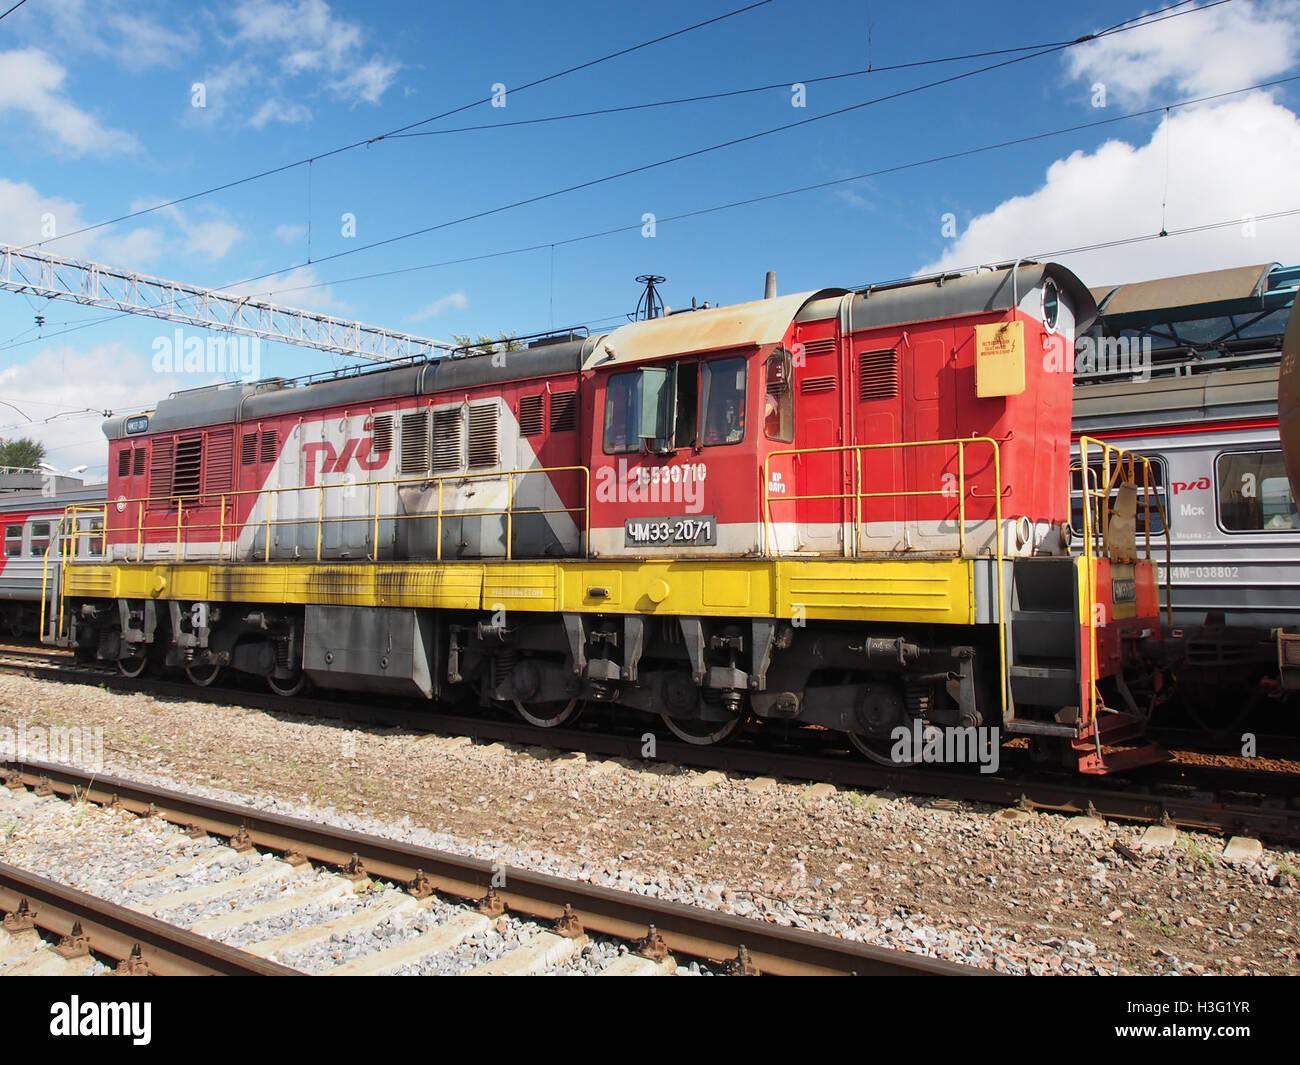 ChME3-2071 at Monino station (1) - Stock Image